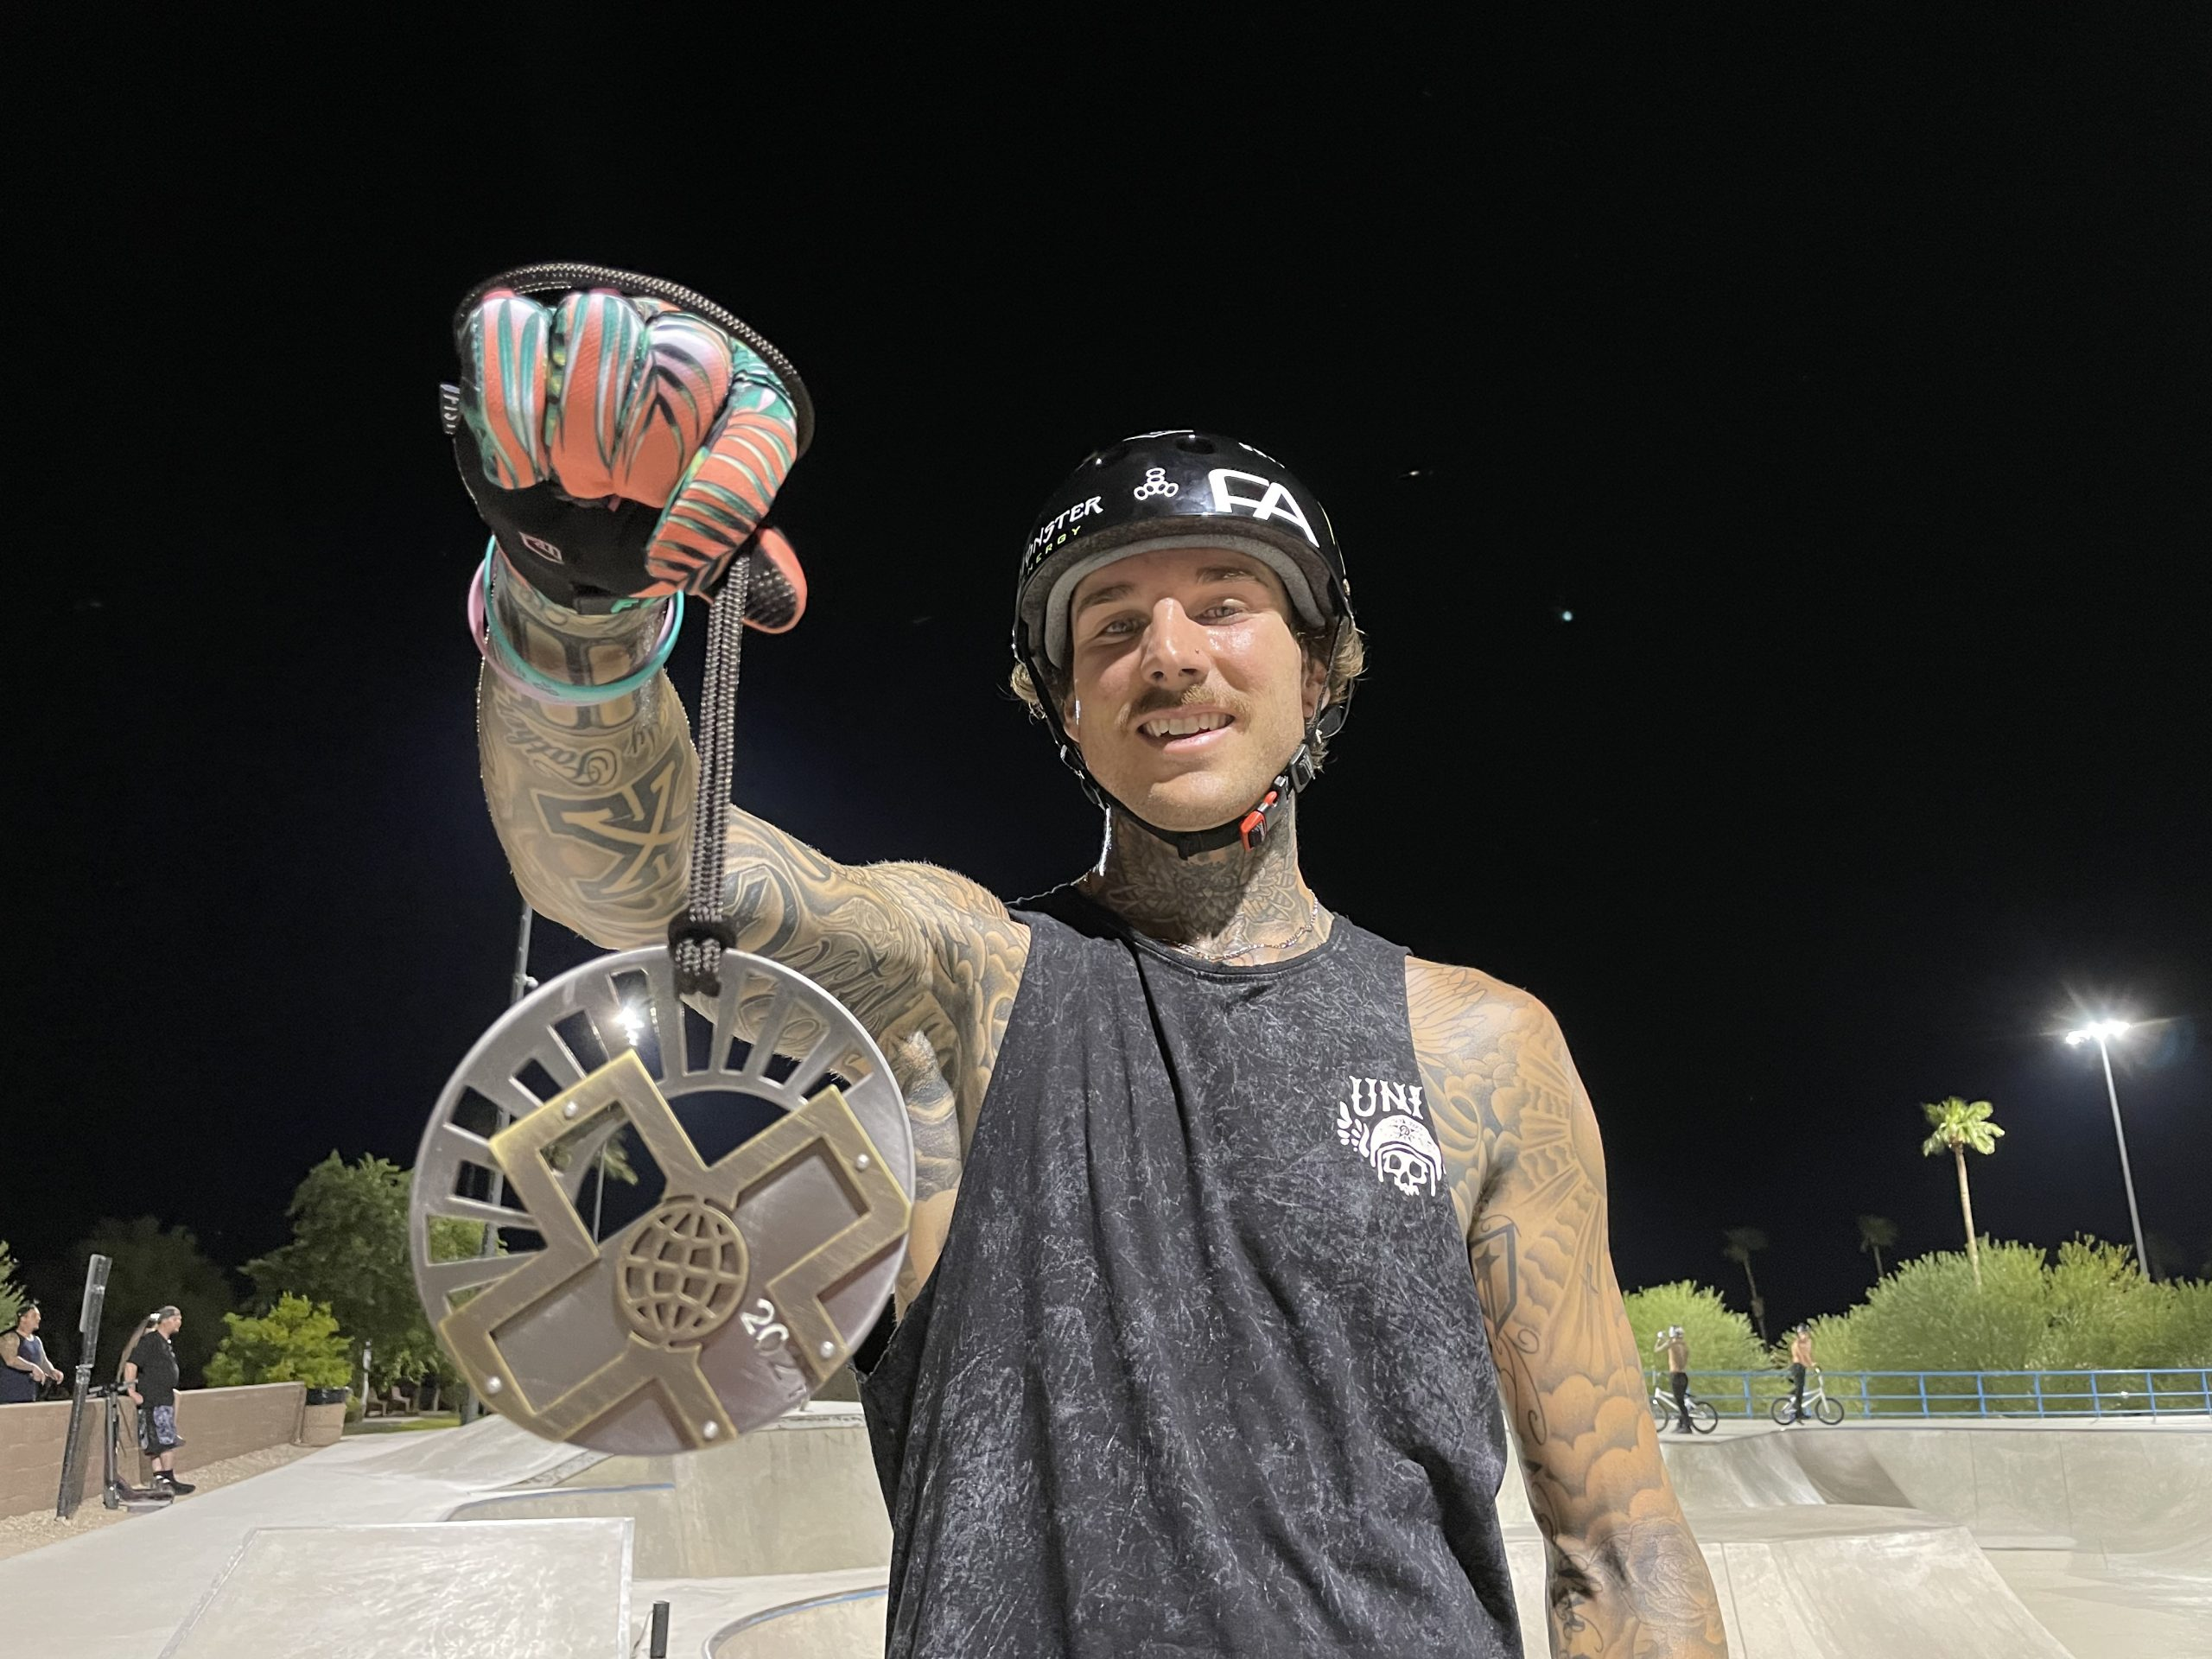 Havasu BMX Rider Brings Home The Hardware